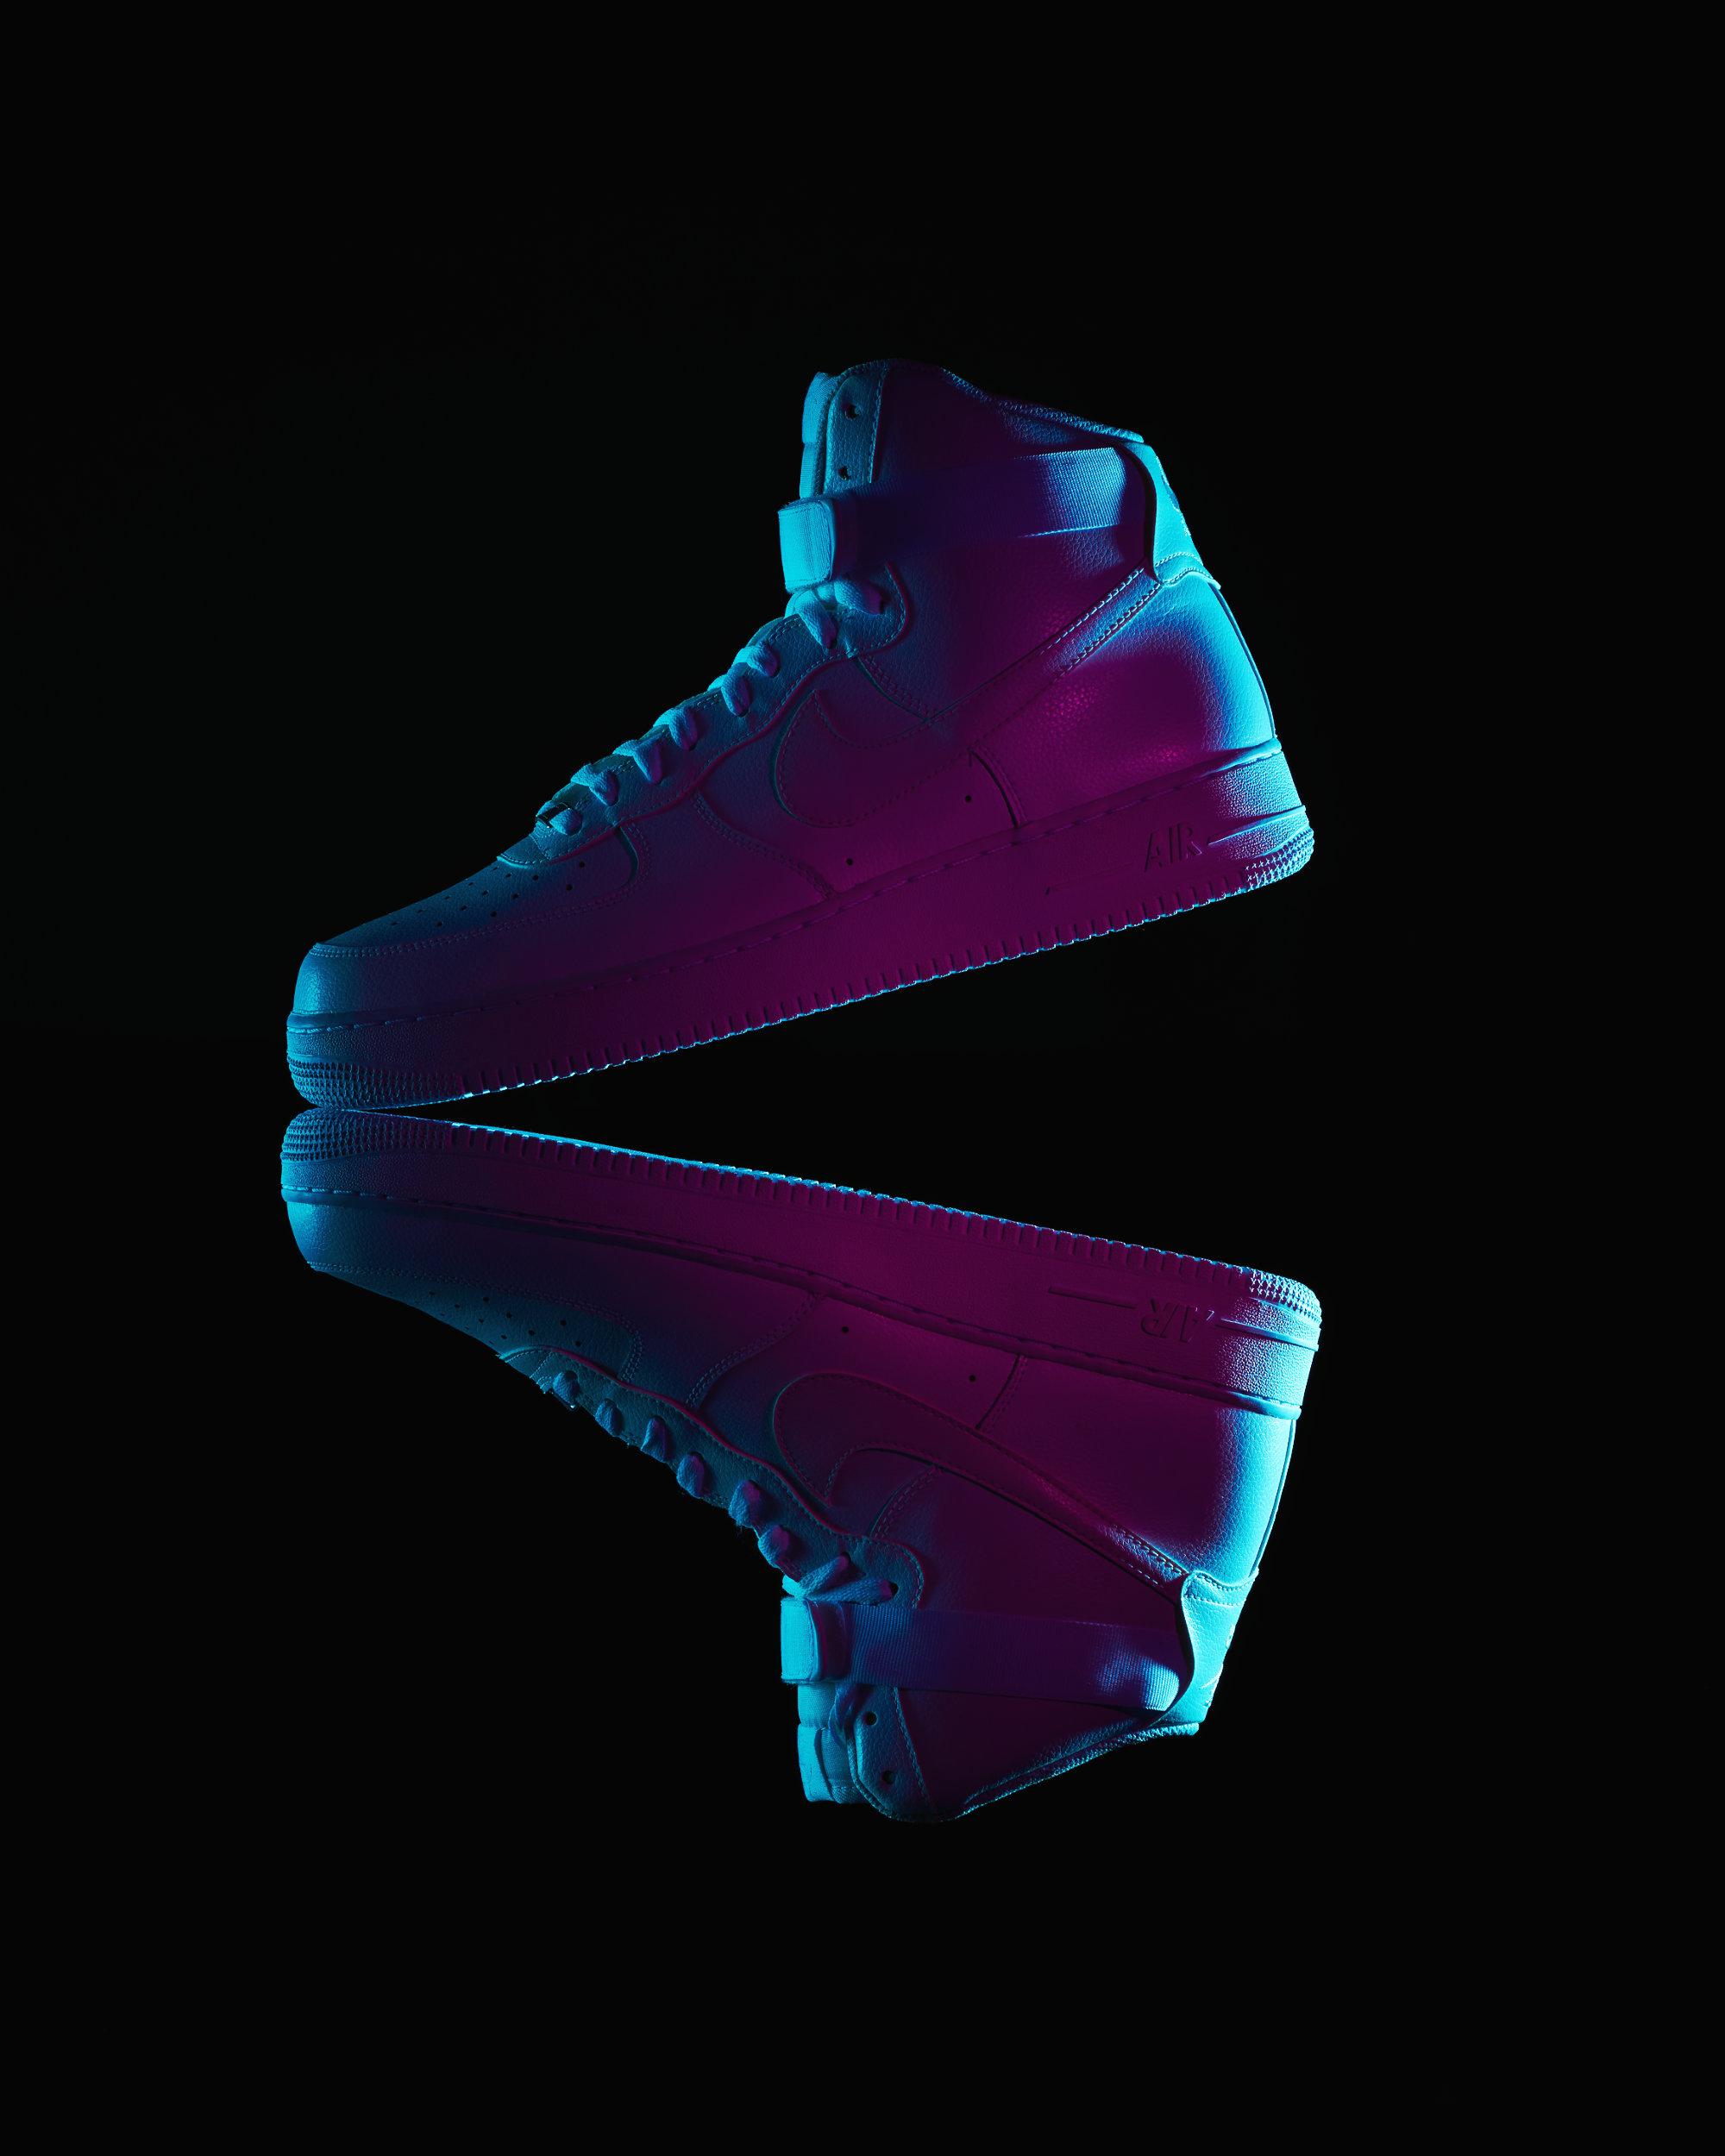 Lichtenau_21_01_2021_Schuhe_Nike_AirForce1_00395